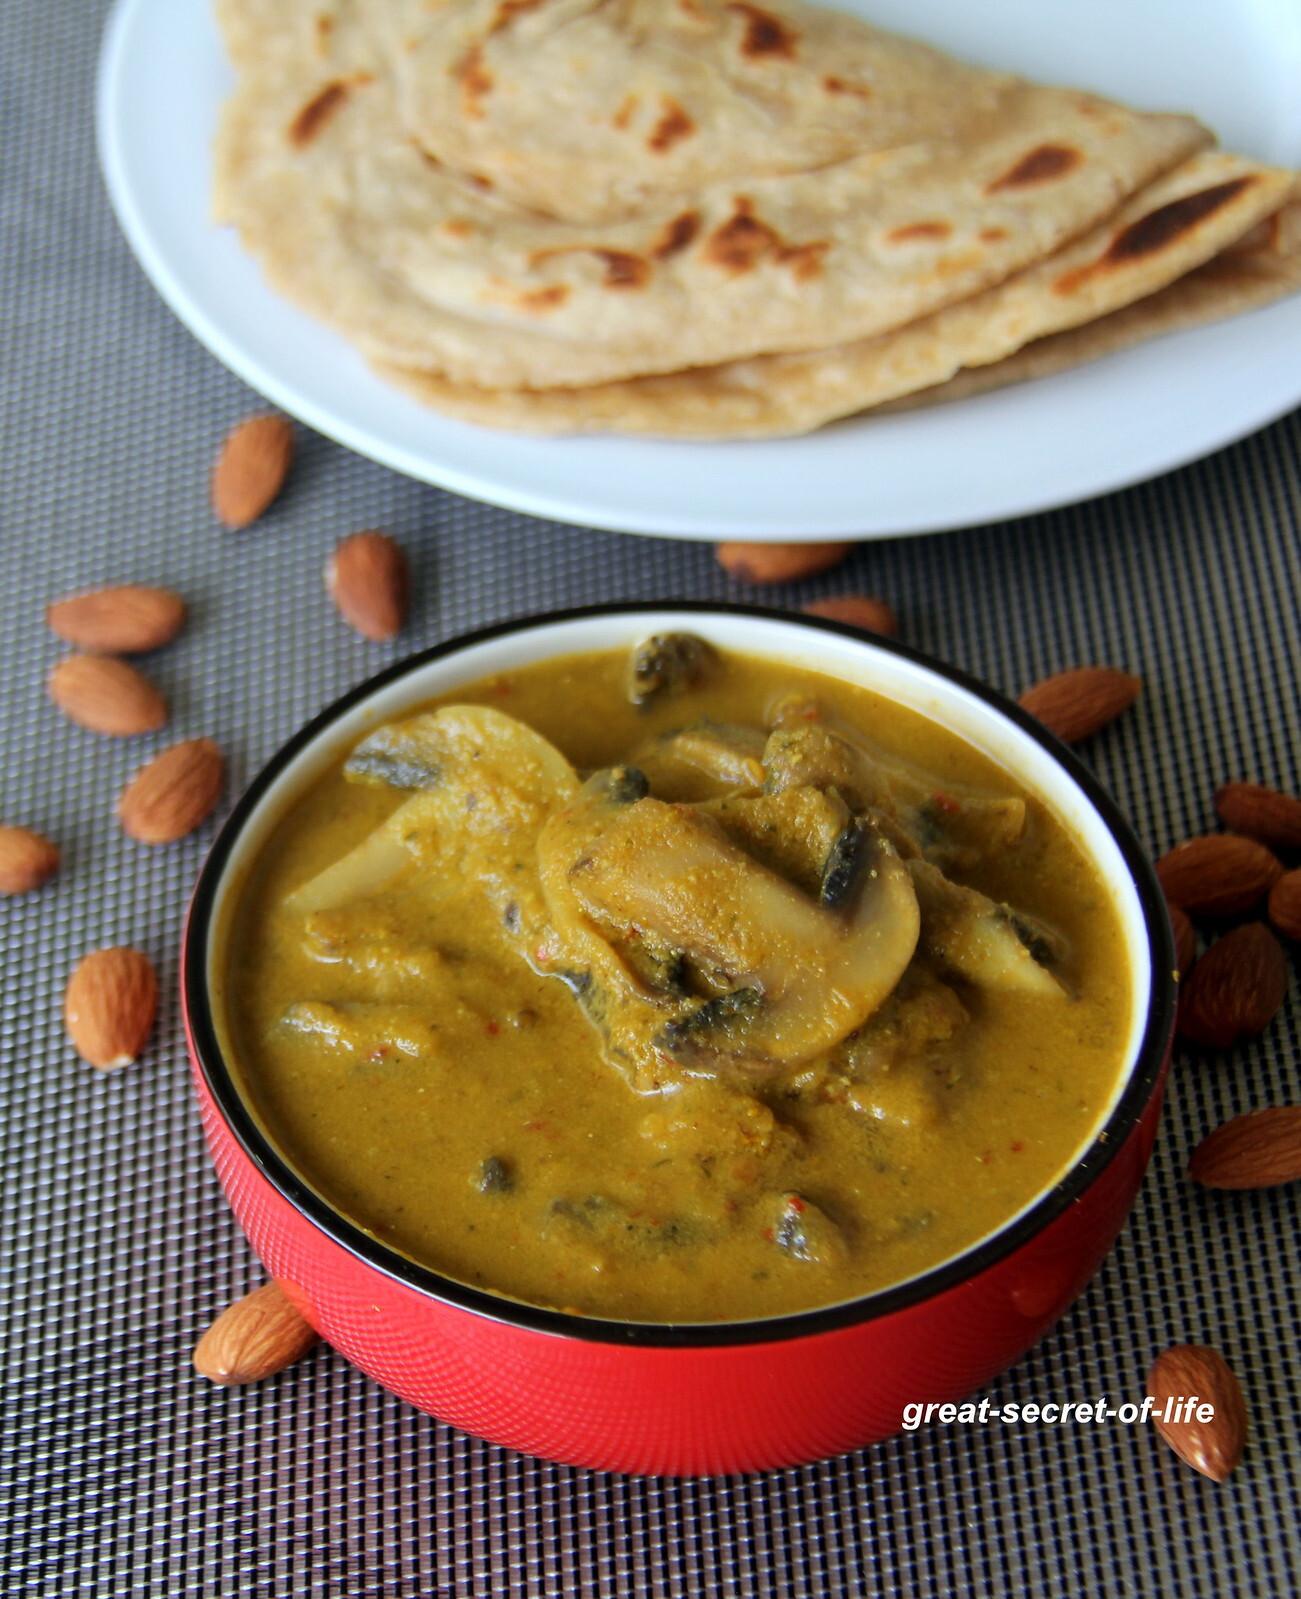 Mushroom korma in Badam gravy - Mushroom Kurma in Almond gravy - Mushroom Kuruma in Almond Gravy - Simple Mushroom recipe